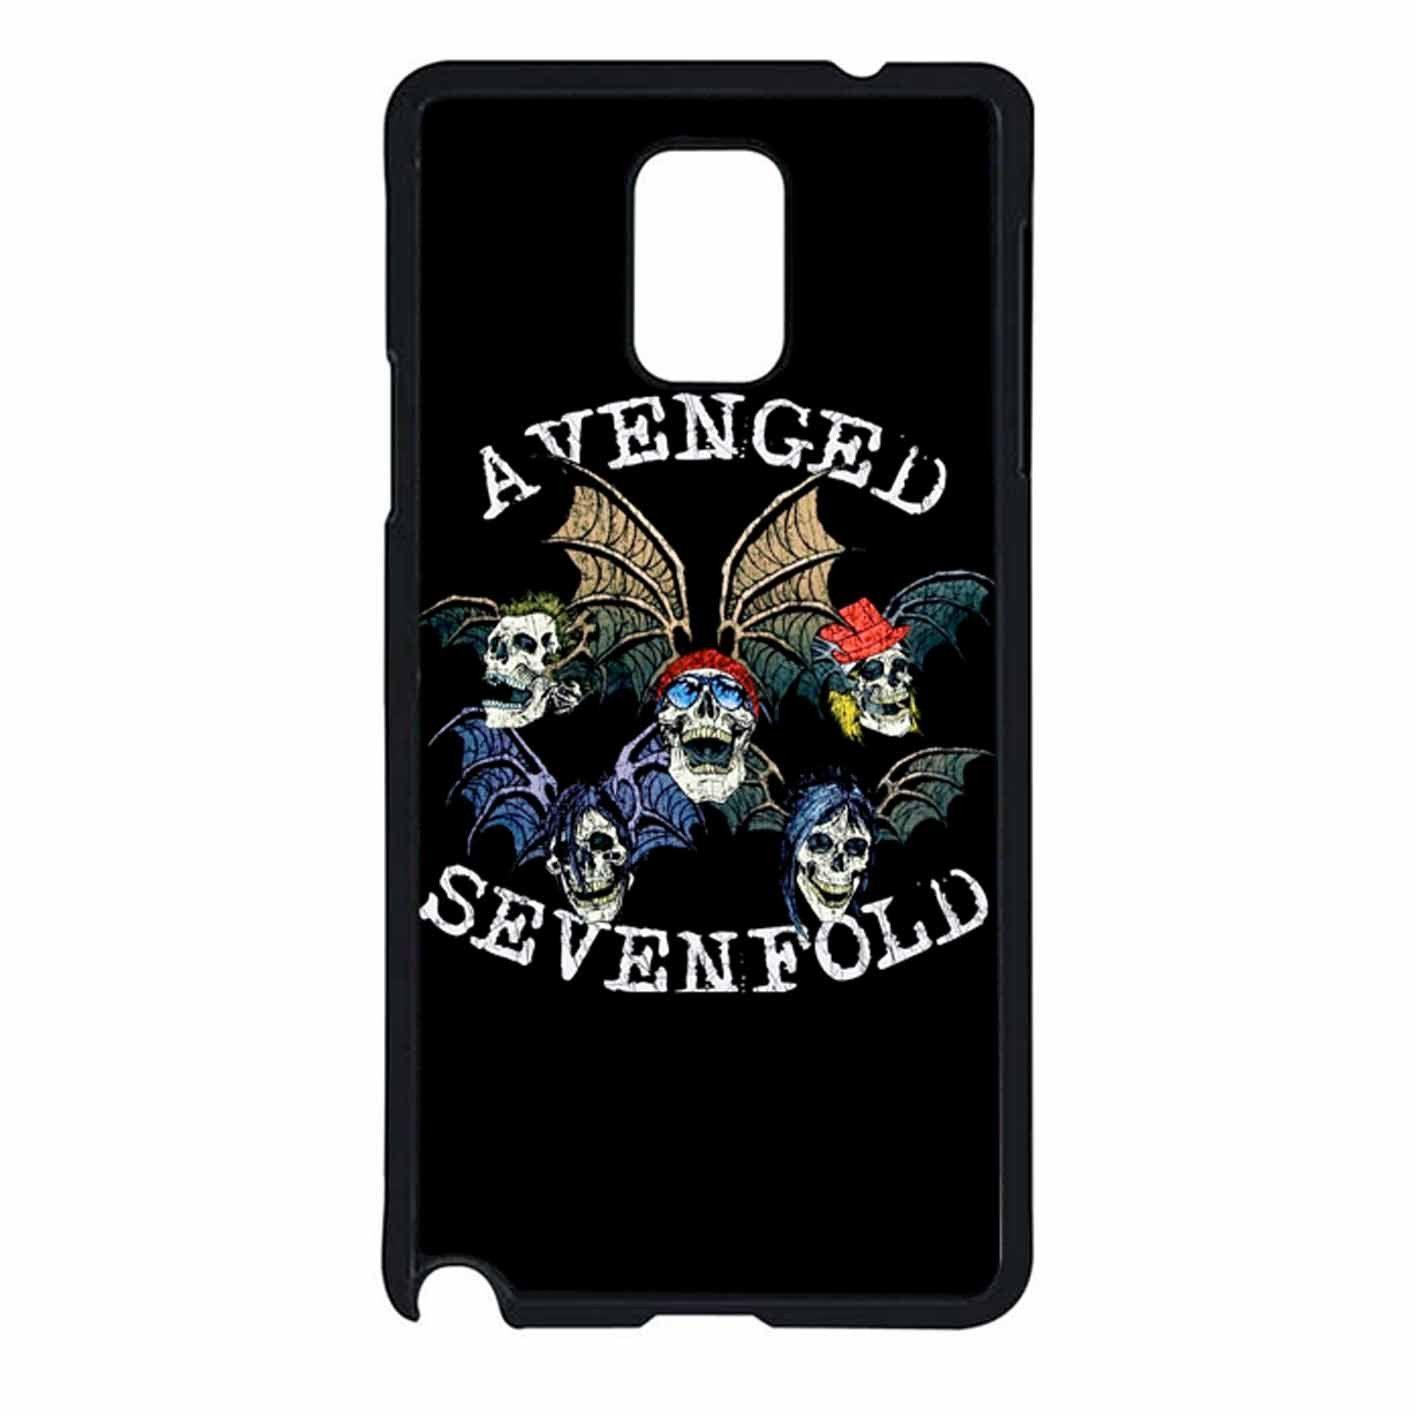 Avenged Sevenfold 2 Samsung Galaxy Note 4 Case